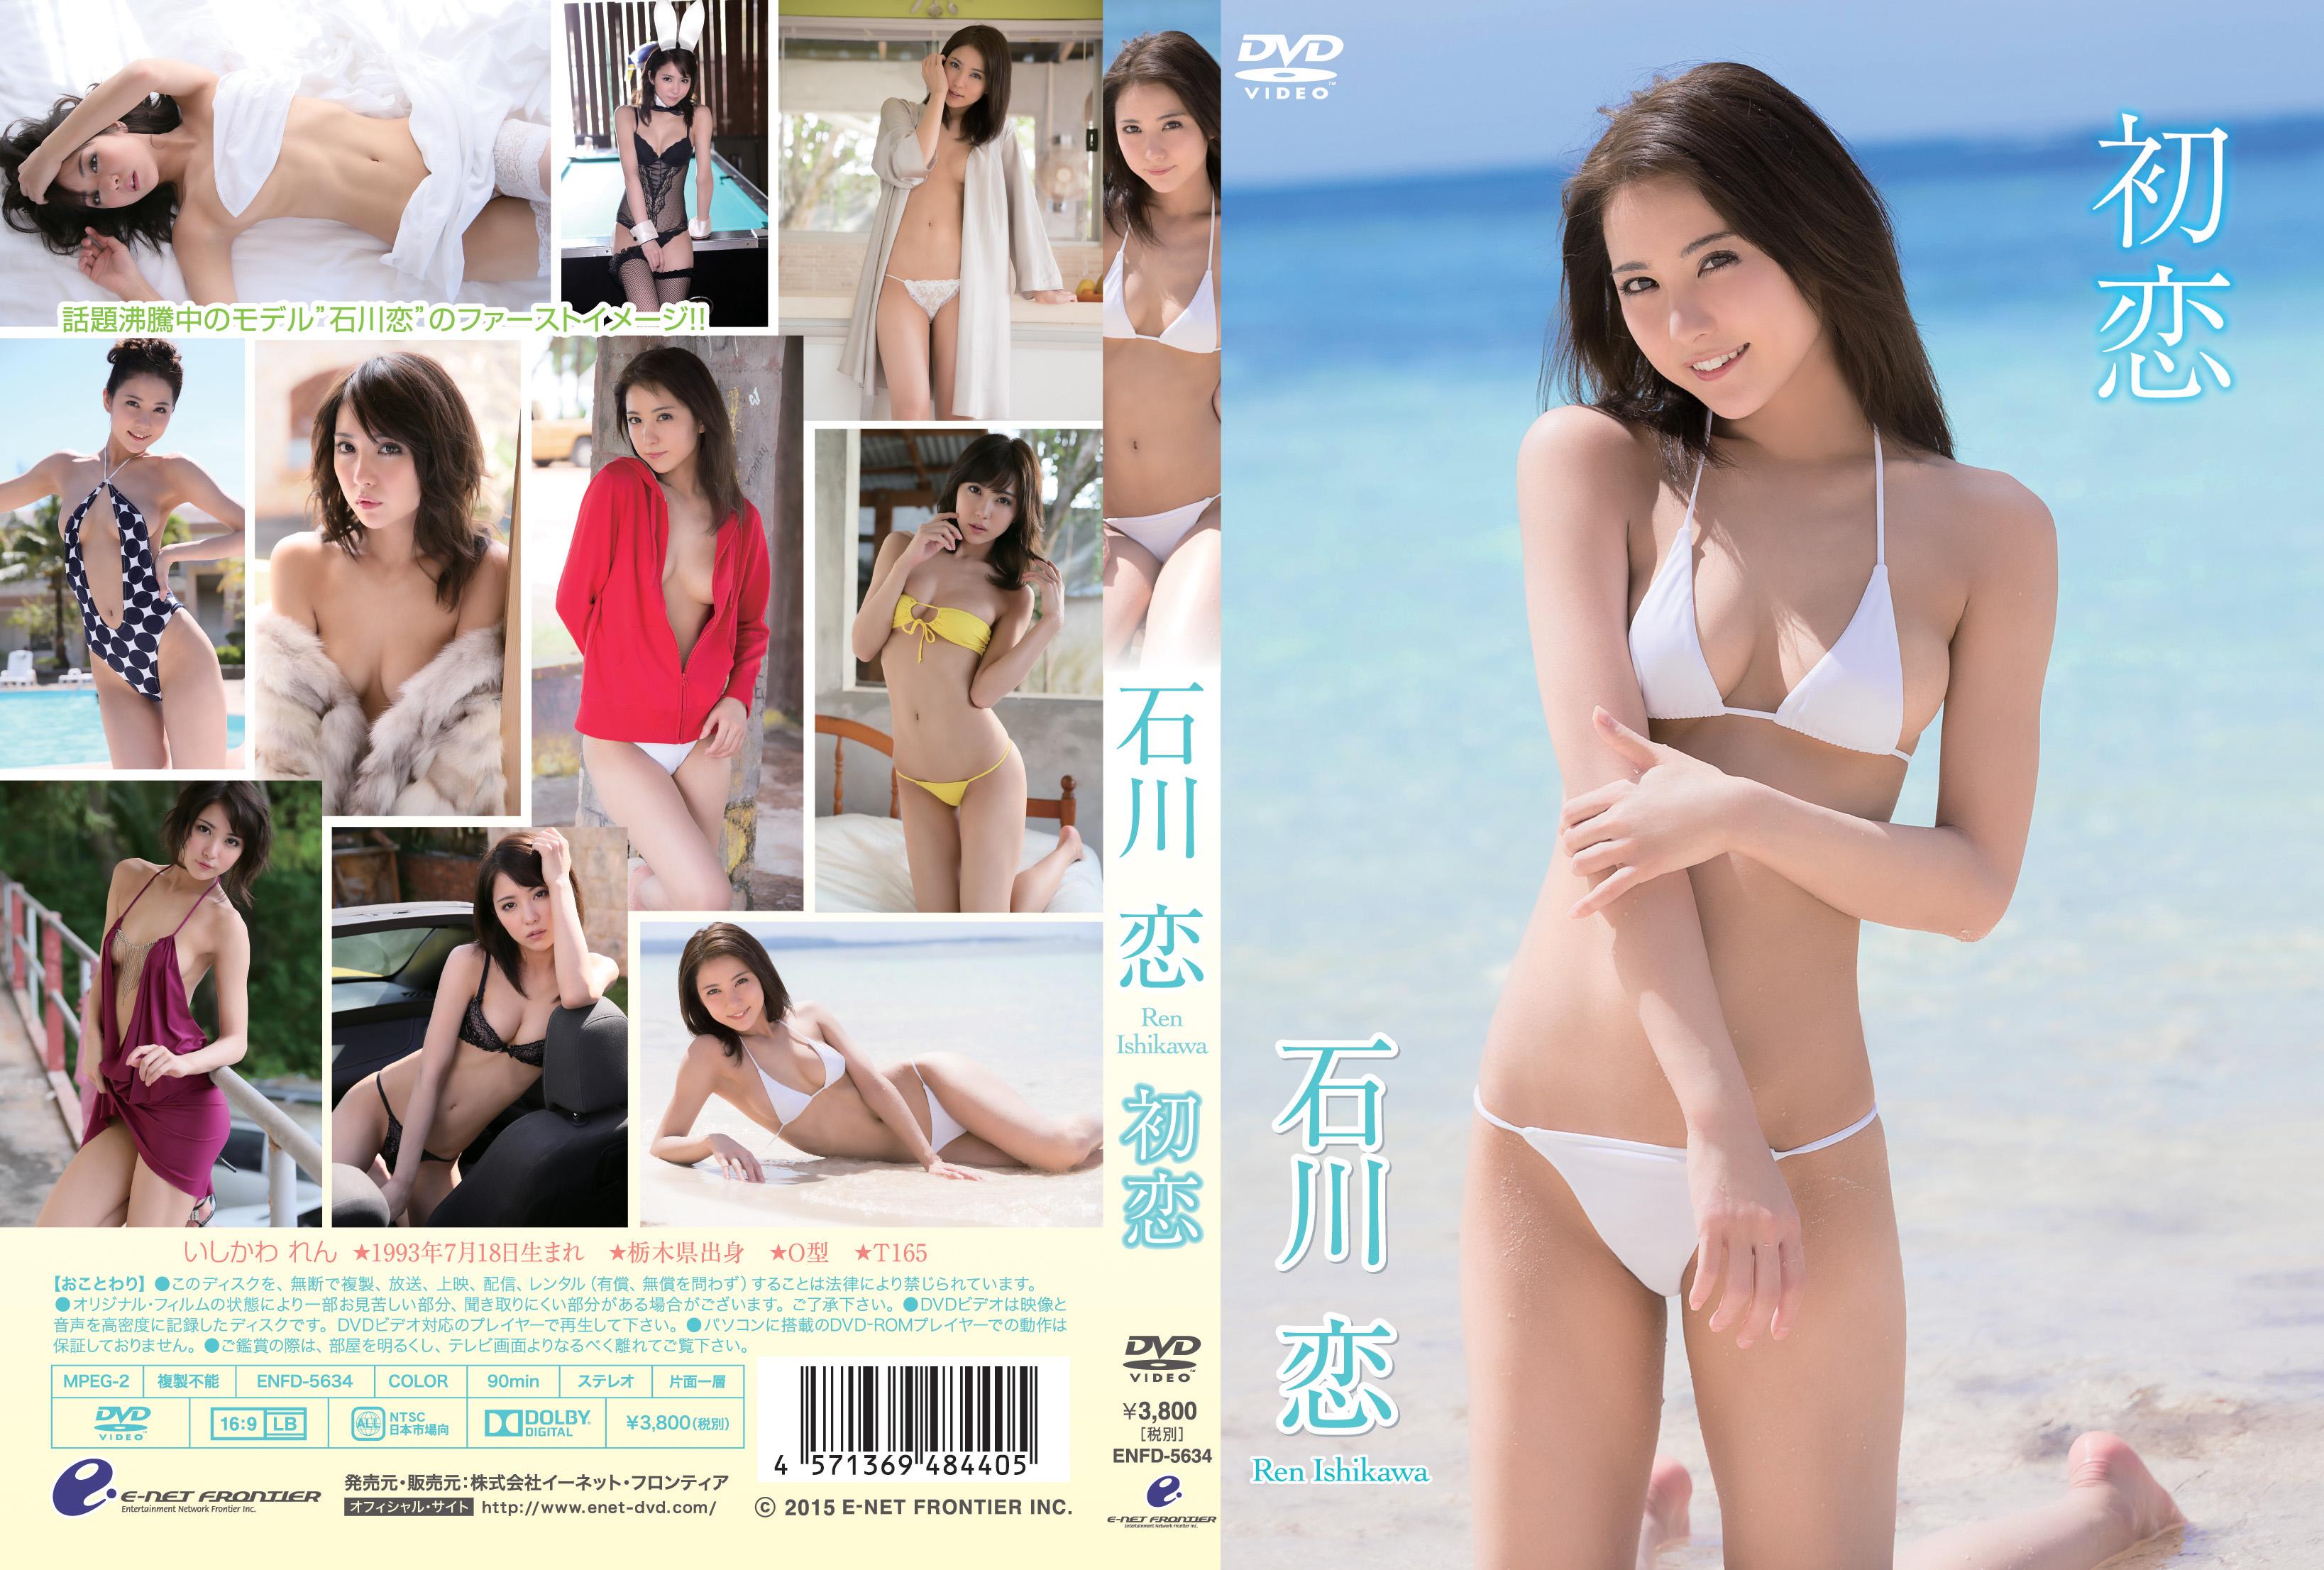 20171206.0048.1 ENFD-5634 cover.jpg